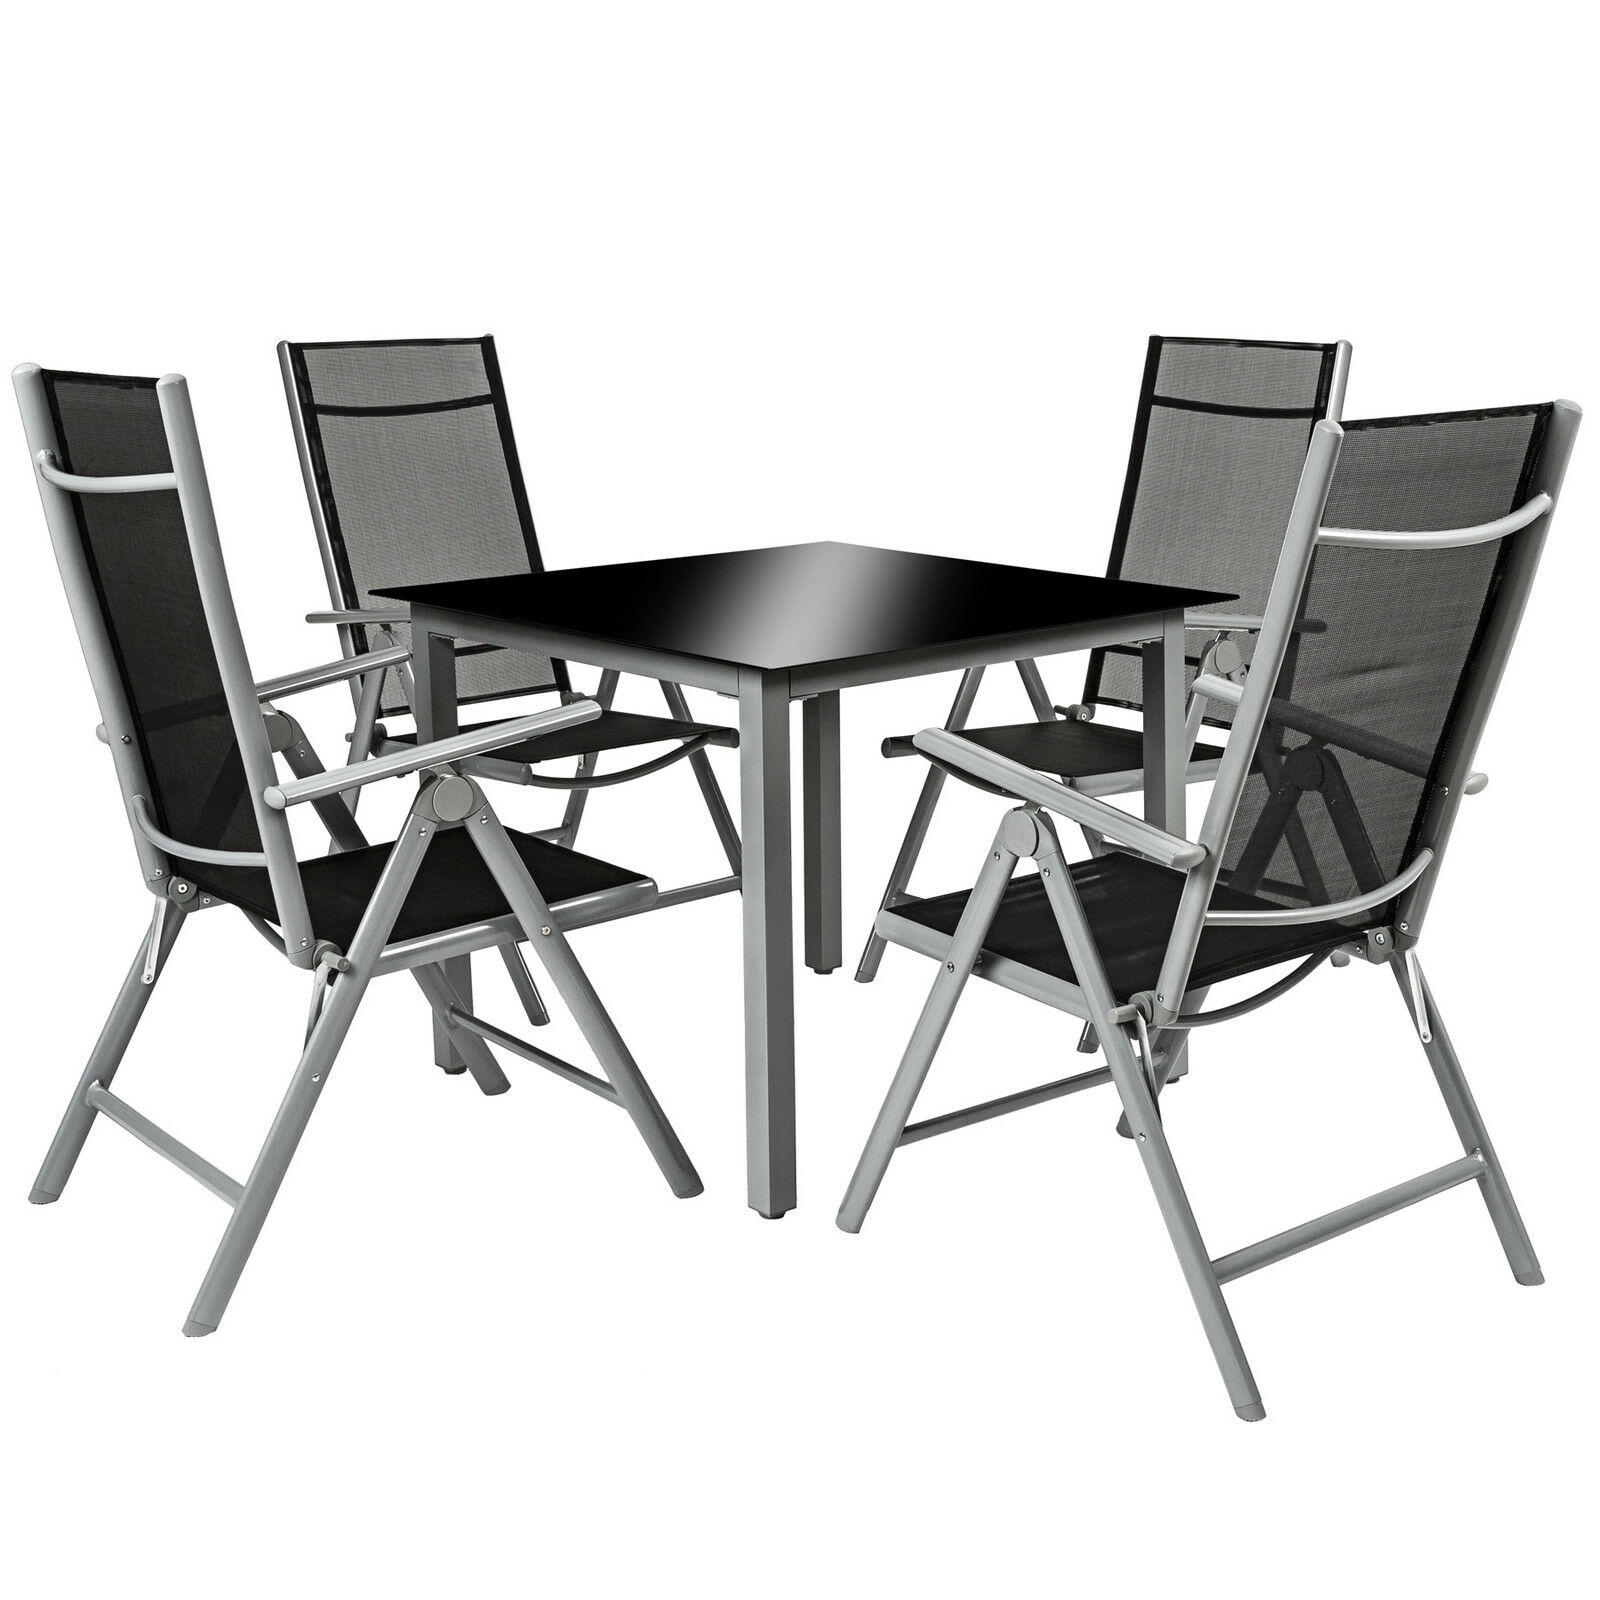 Aluminio conjunto muebles de jardin 4 1 silla adjustable for Sillas de jardin de aluminio